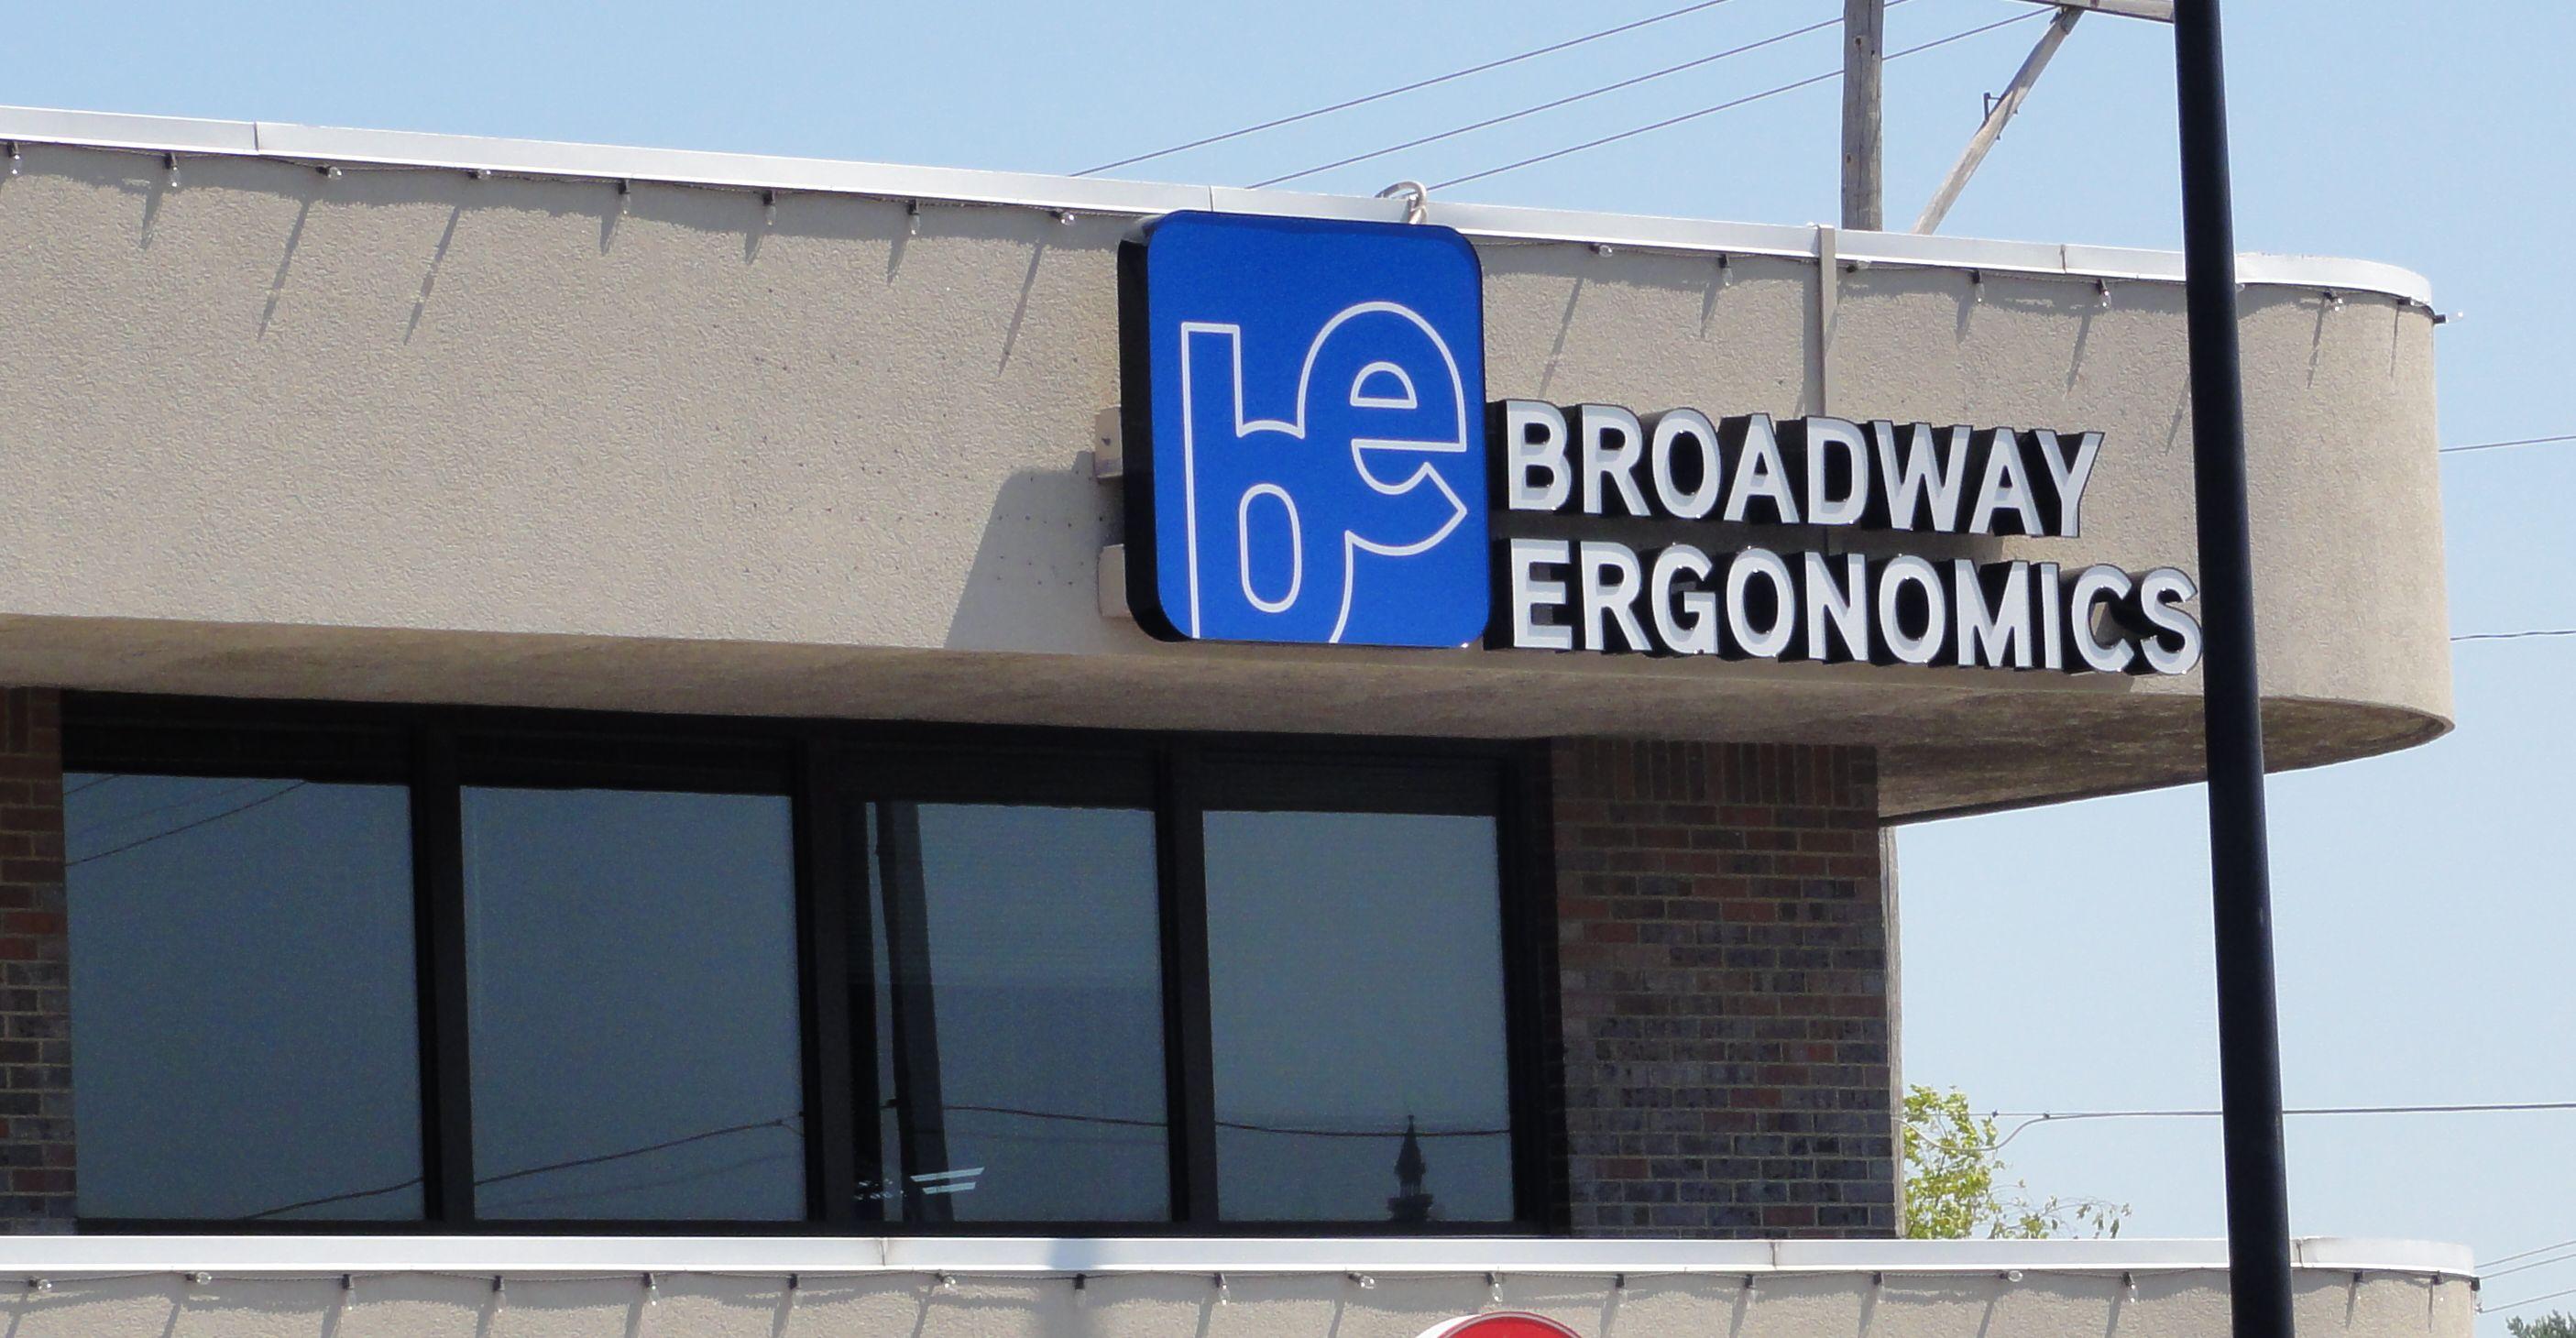 Broadway Ergonomics, LLC